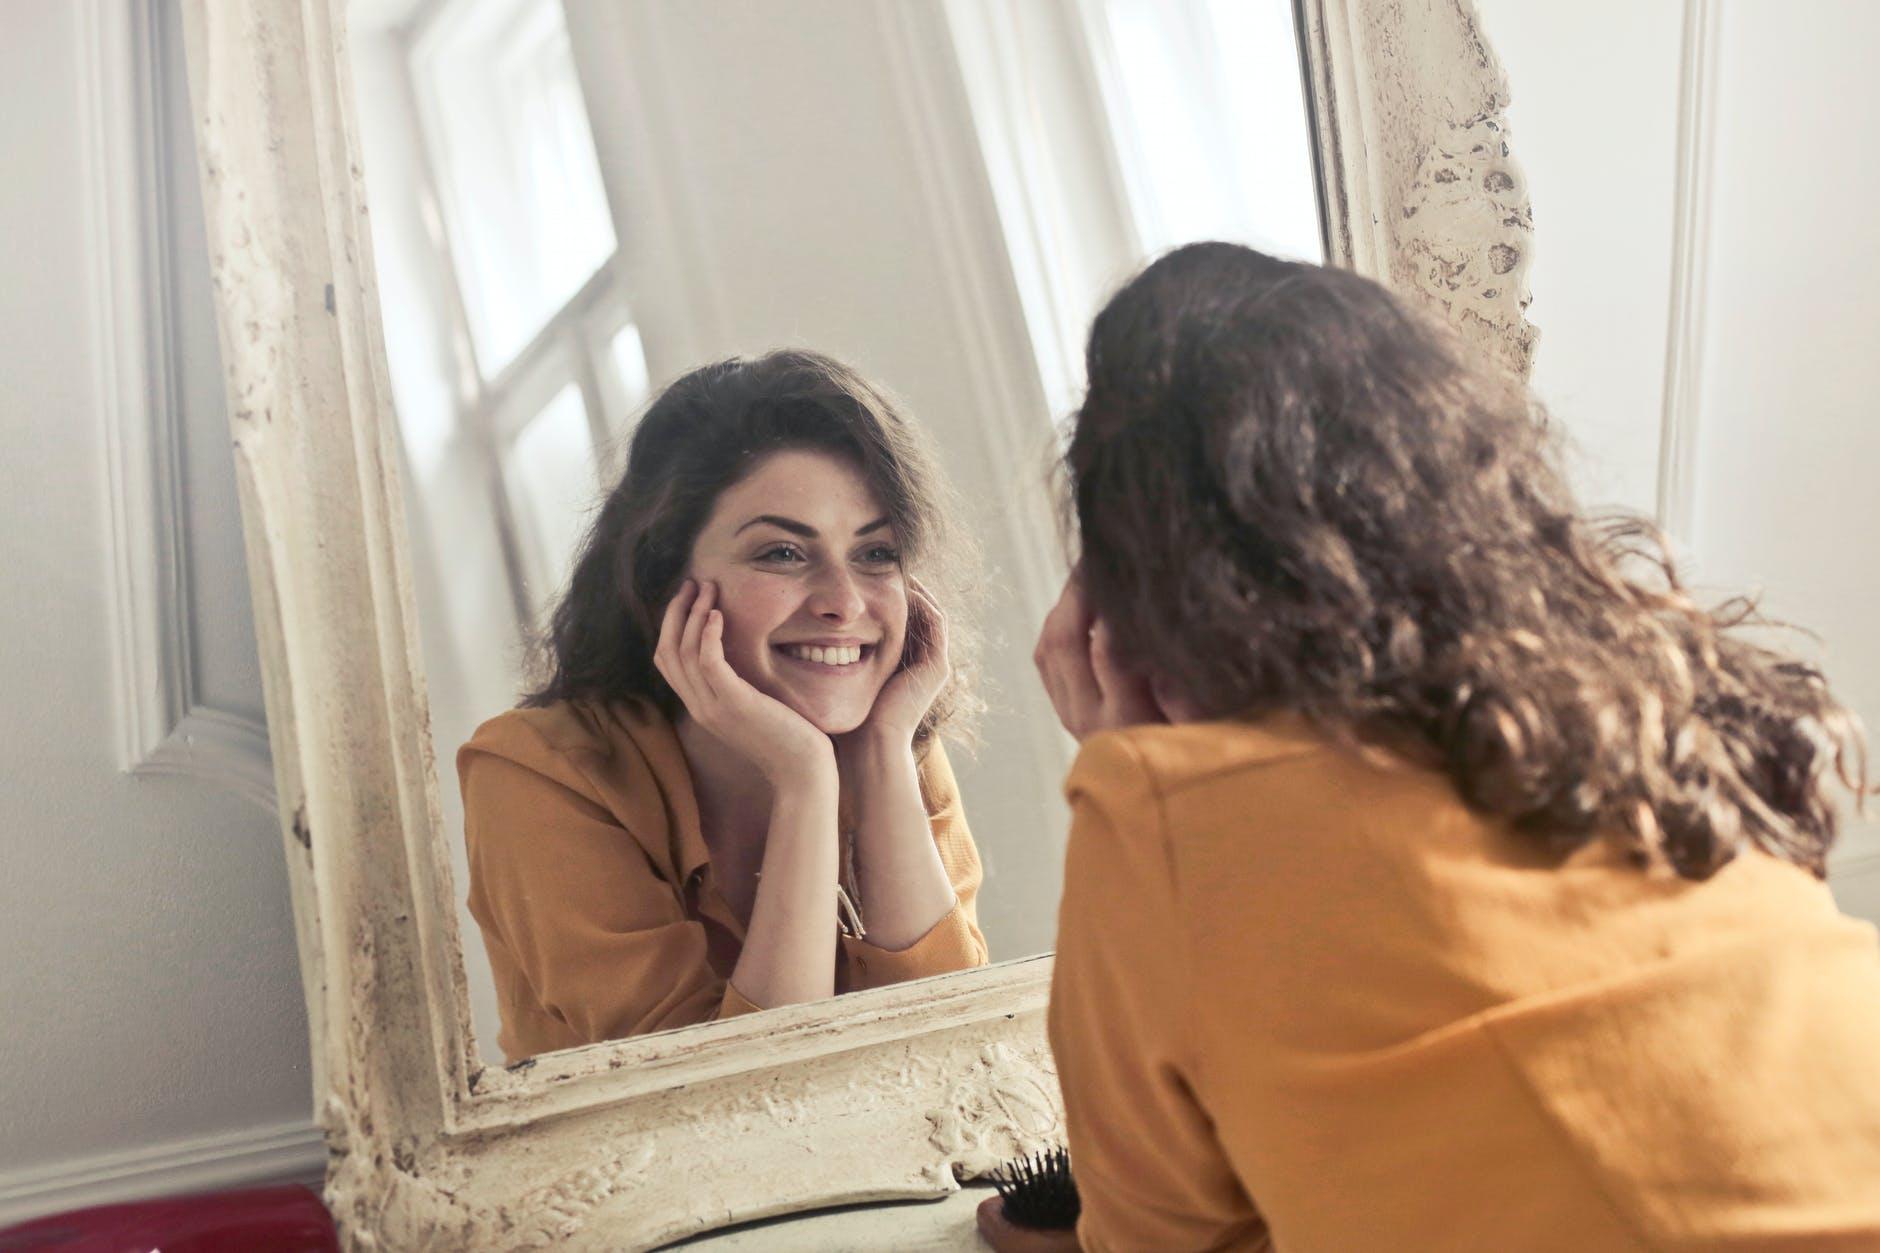 Cum poti sa iti detoxifiezi organismul prin schimbarea rutinei de infrumusetare? – Partea 1